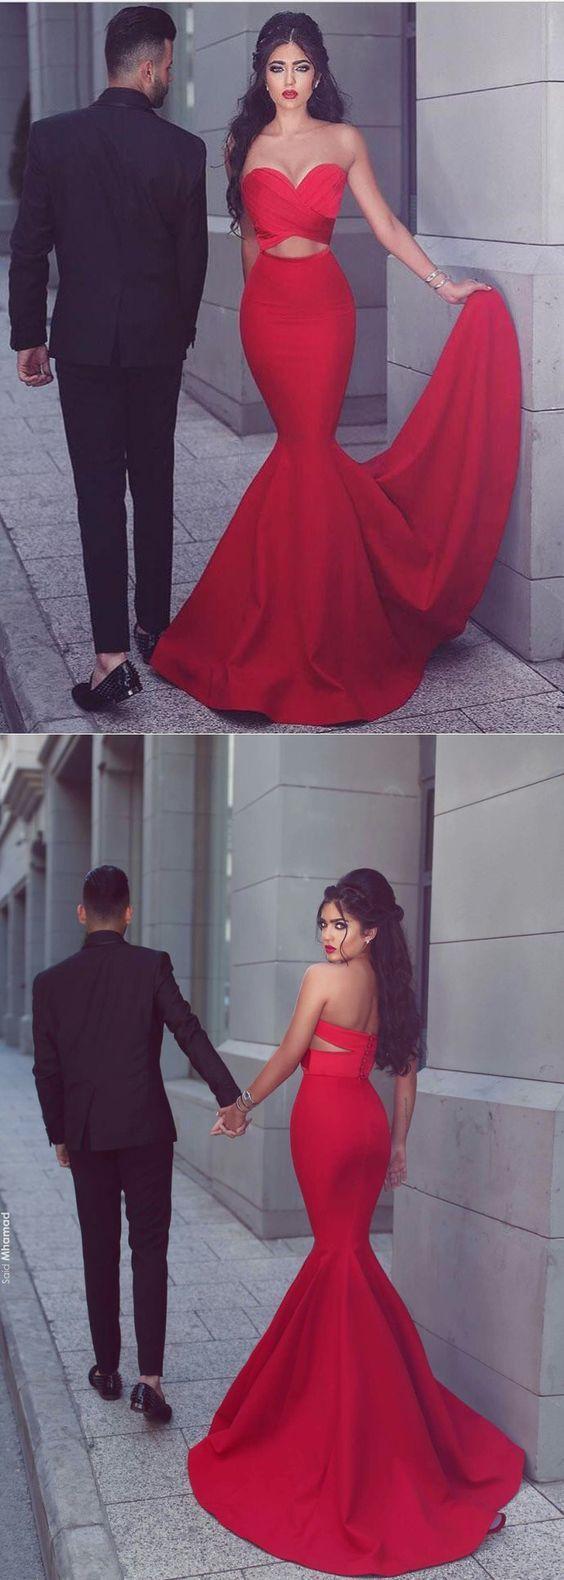 Sweetheart Prom Dress,Mermaid Prom Dress,Red Prom Dress,Fashion Prom Dress,Sexy Party Dress, New Style Evening Dress